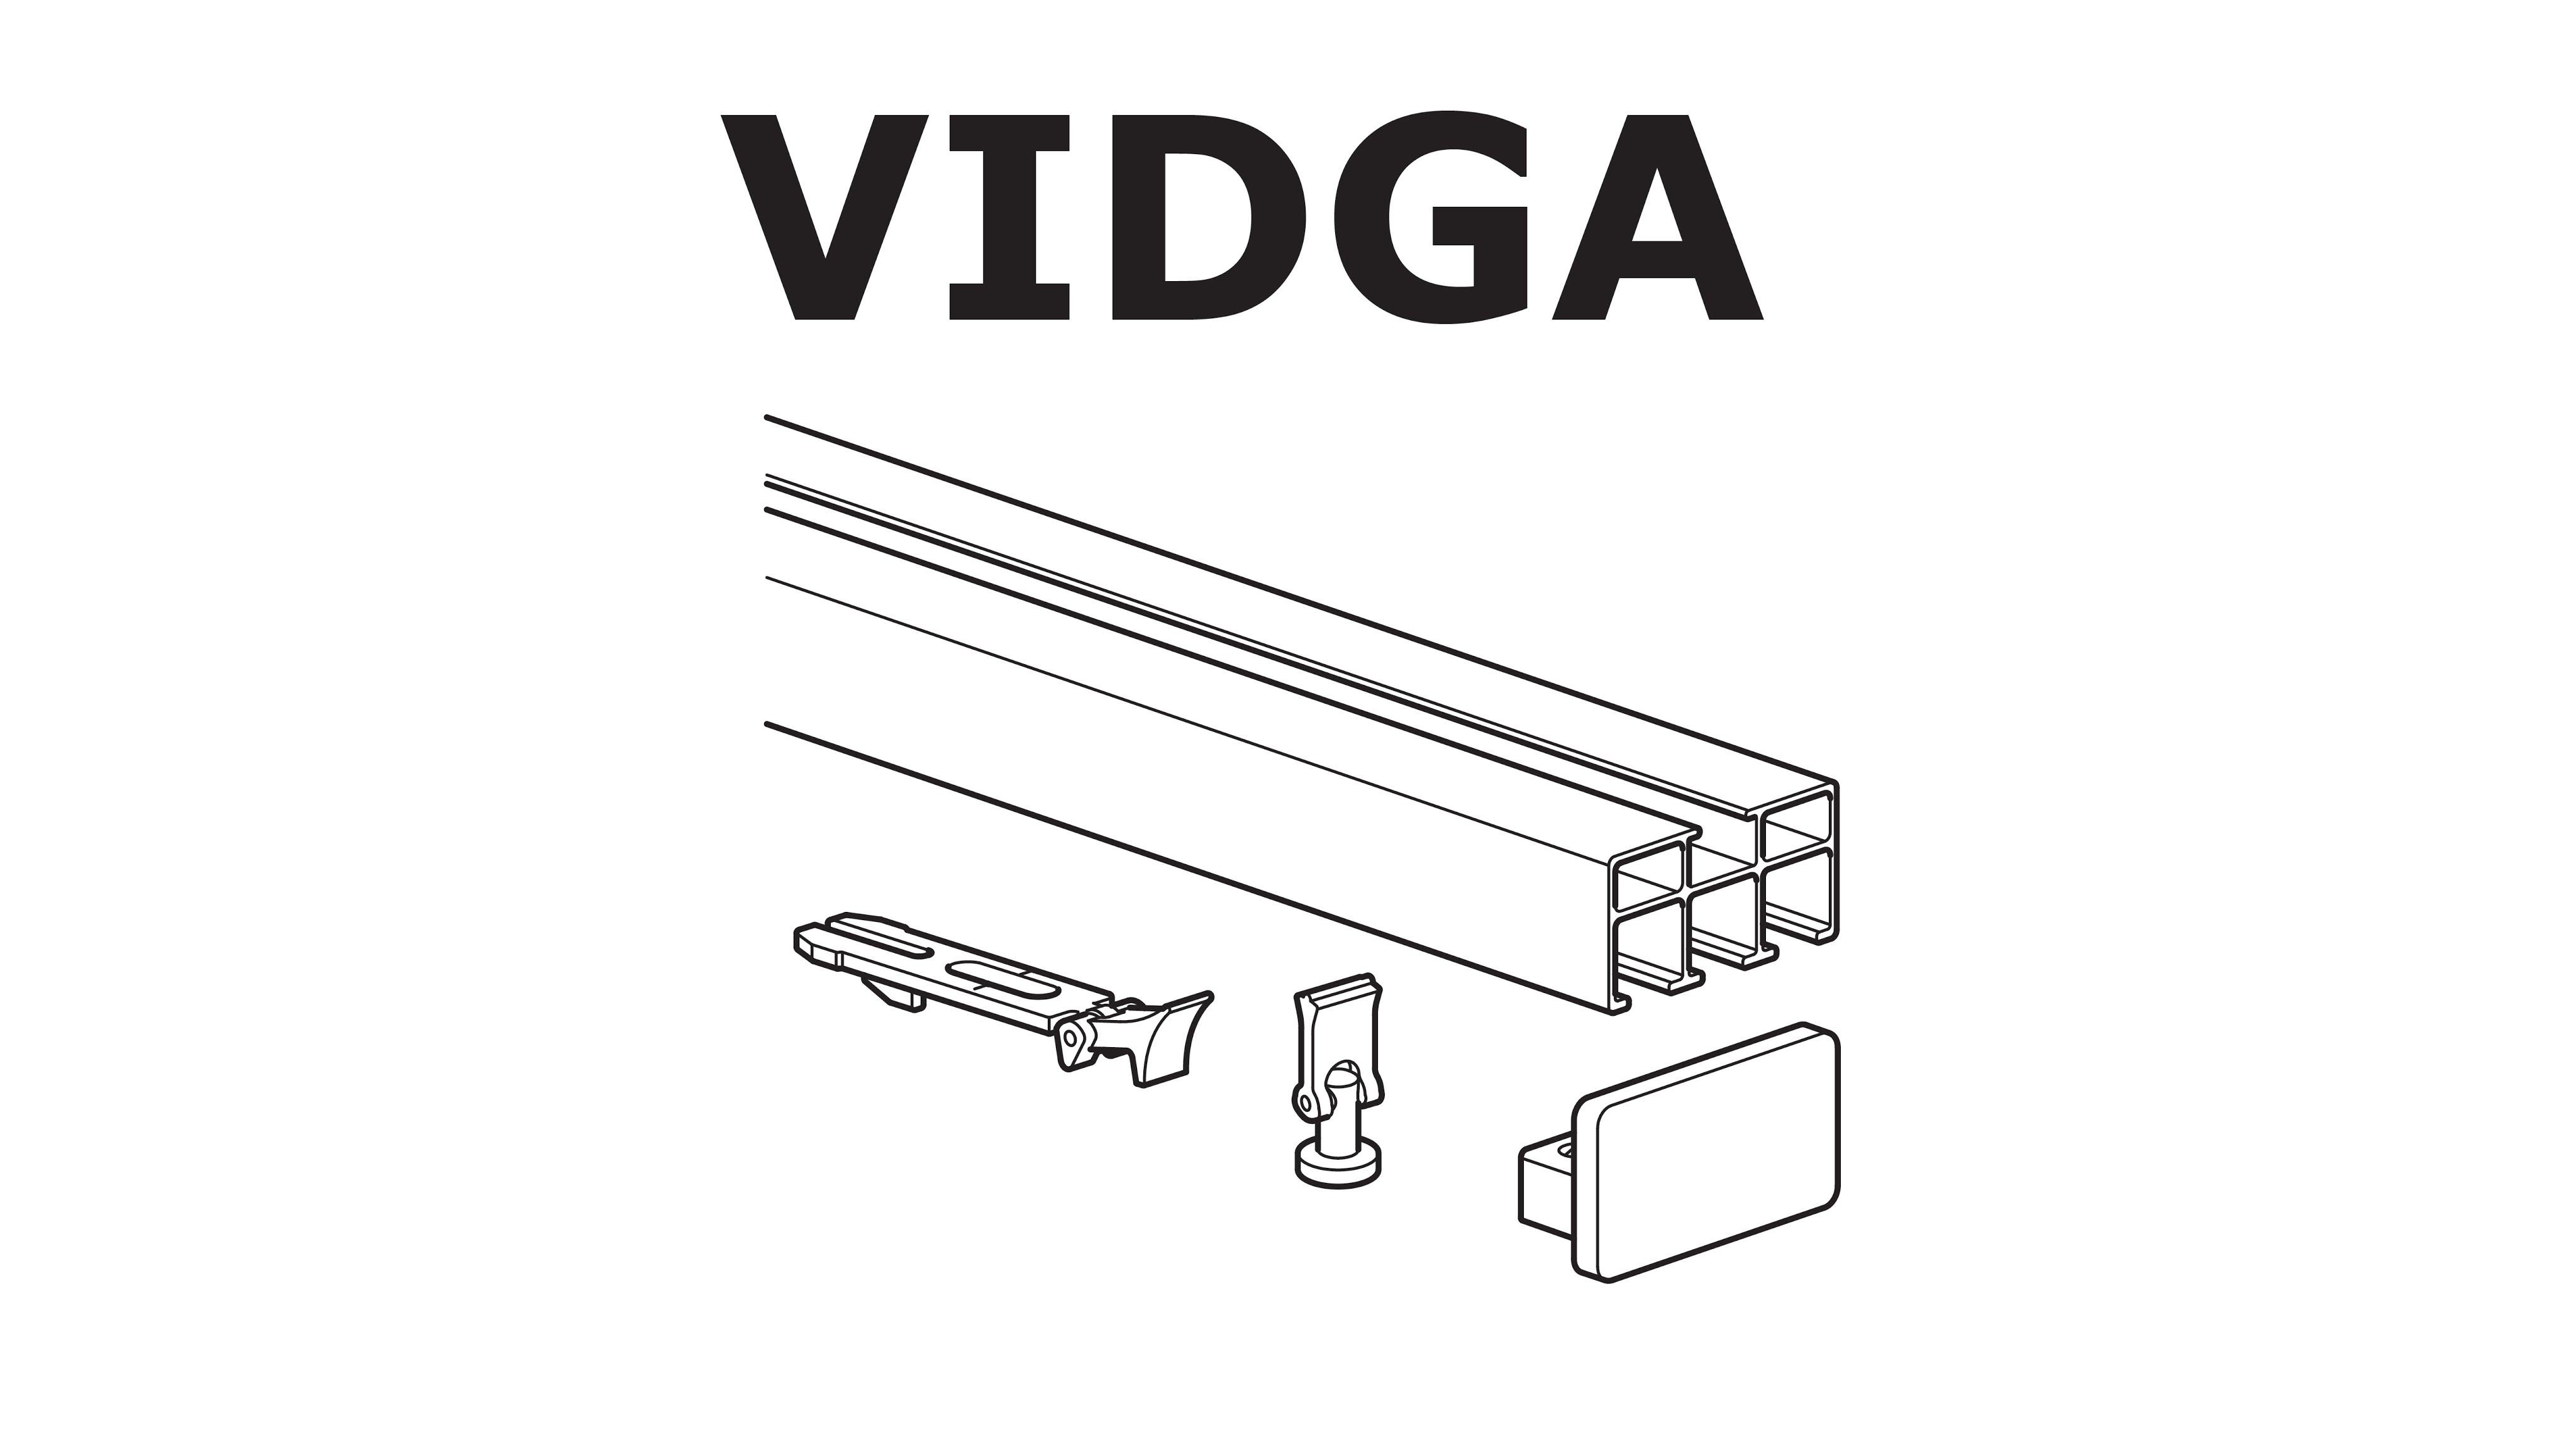 HOW TO INSTALL IKEA VIDGA RAIL: TRIPLE TRACK - YouTube